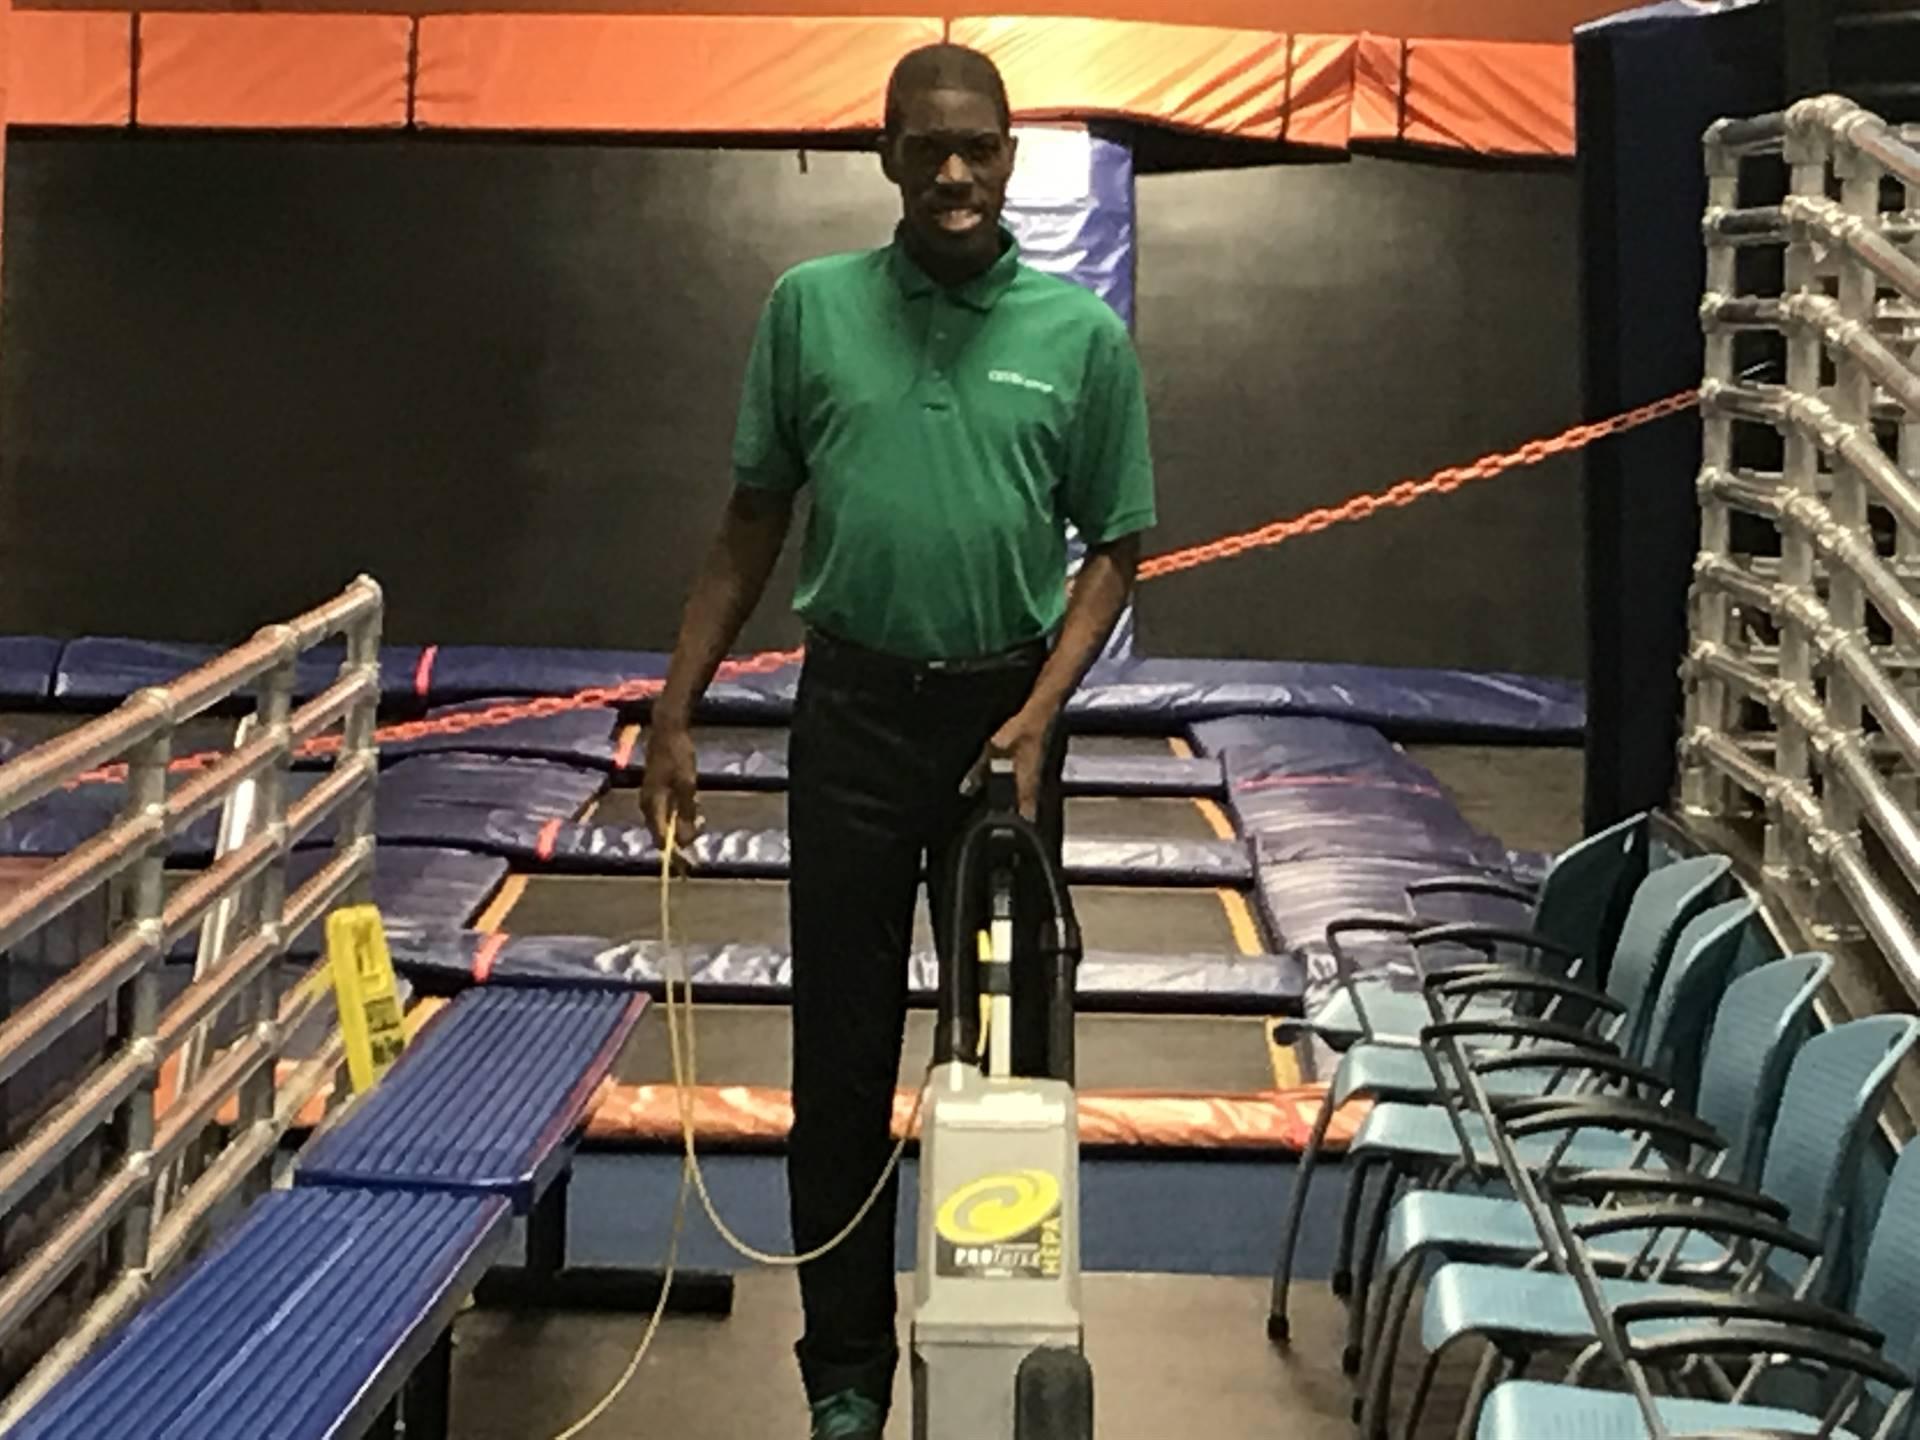 Jaylen Vacuuming at Sky Zone